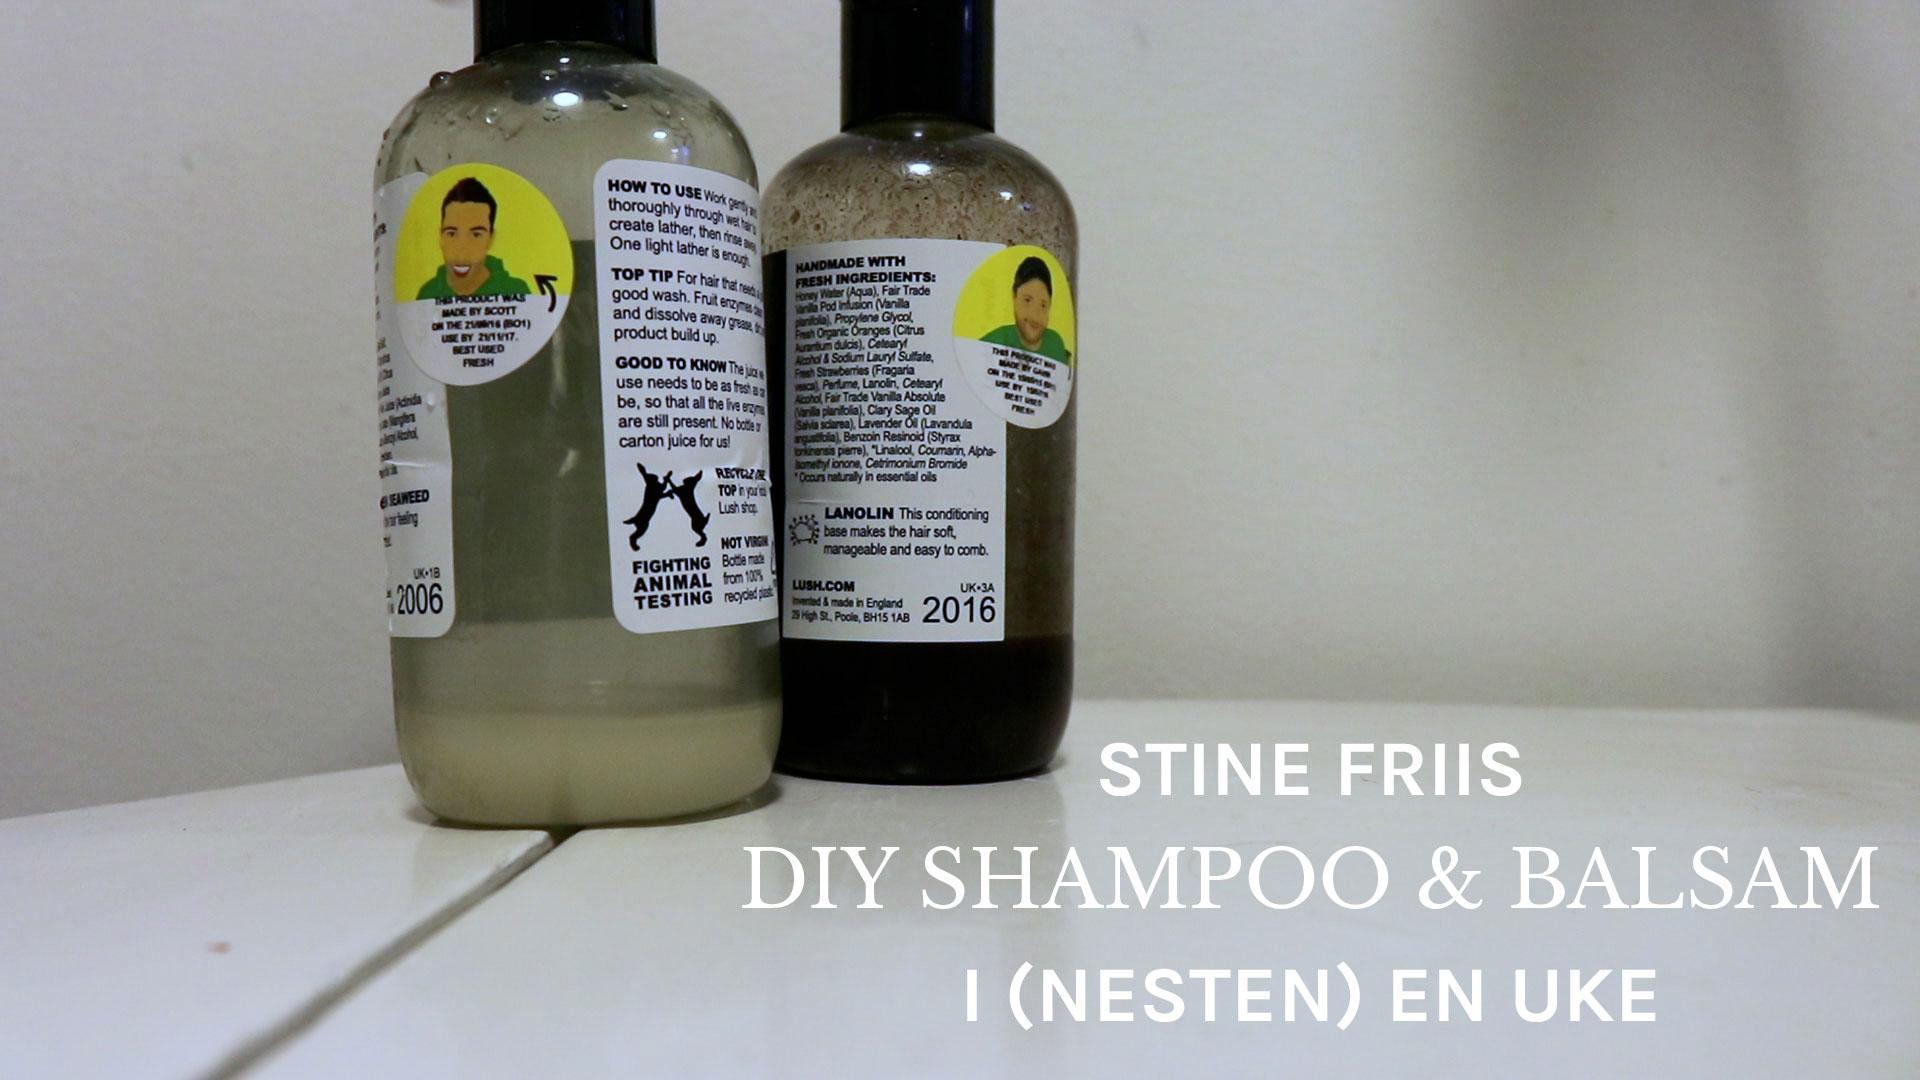 Jeg testet DIY shampoo og balsam i en uke.